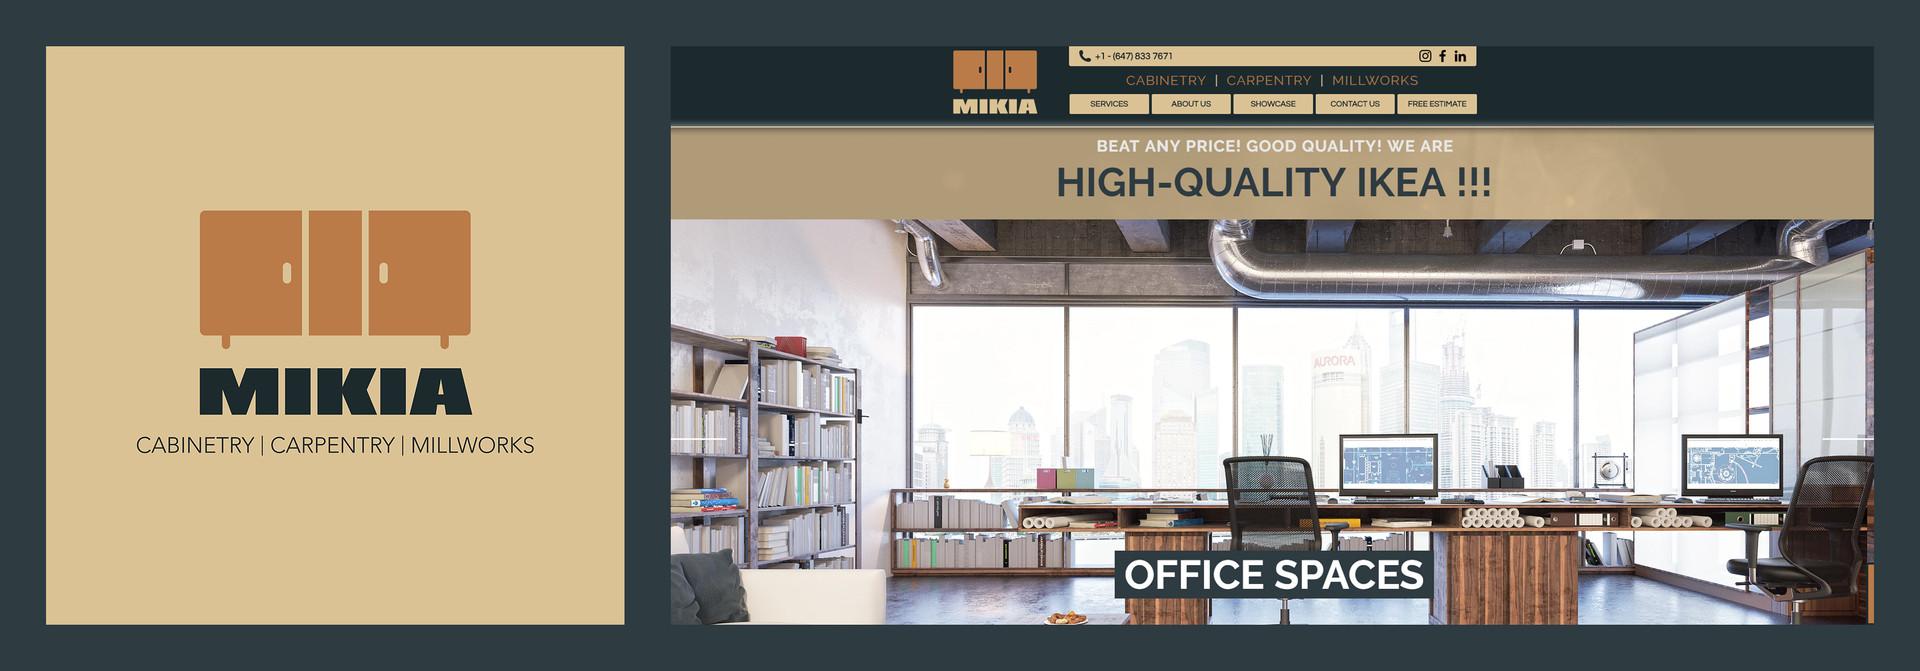 mikia-cabinets-responsive-website-design